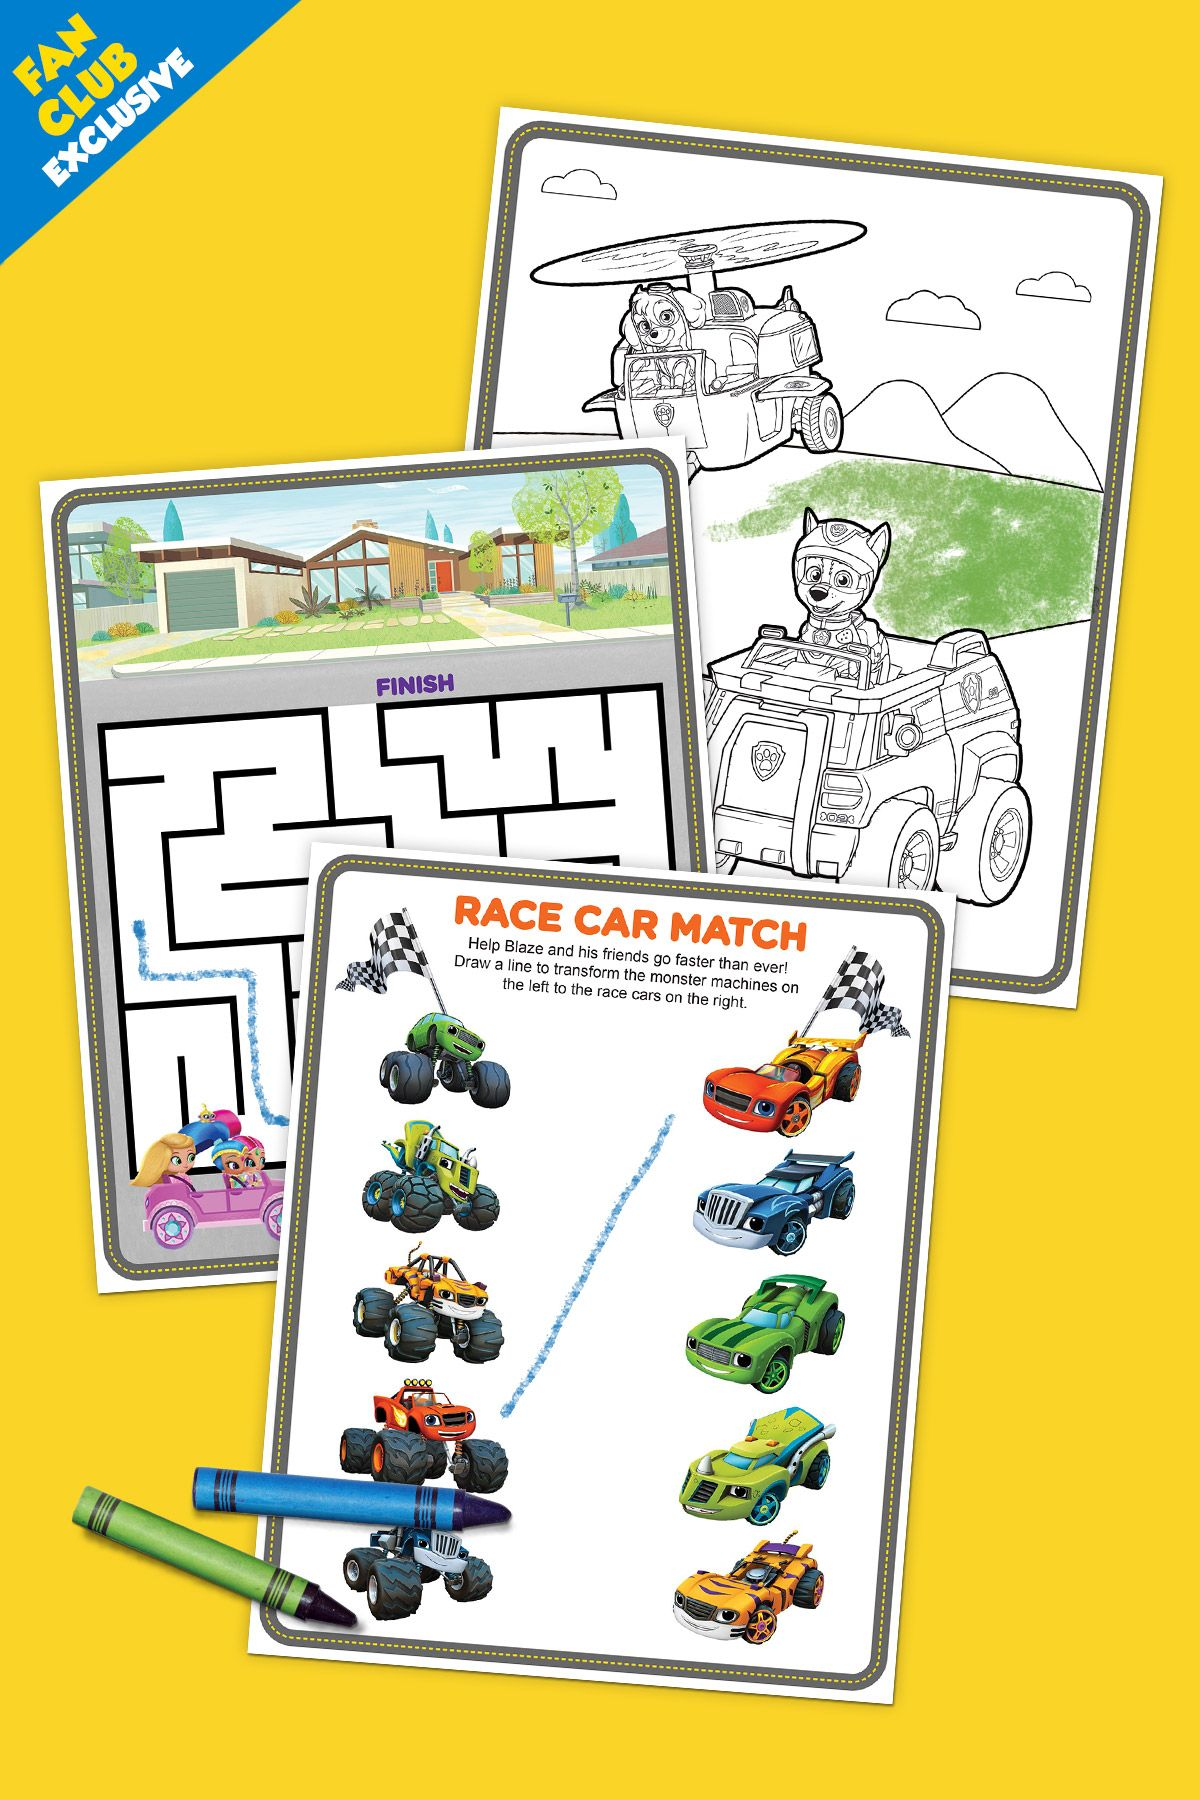 Fan Club Exclusive Nick Jr Vehicle Pack